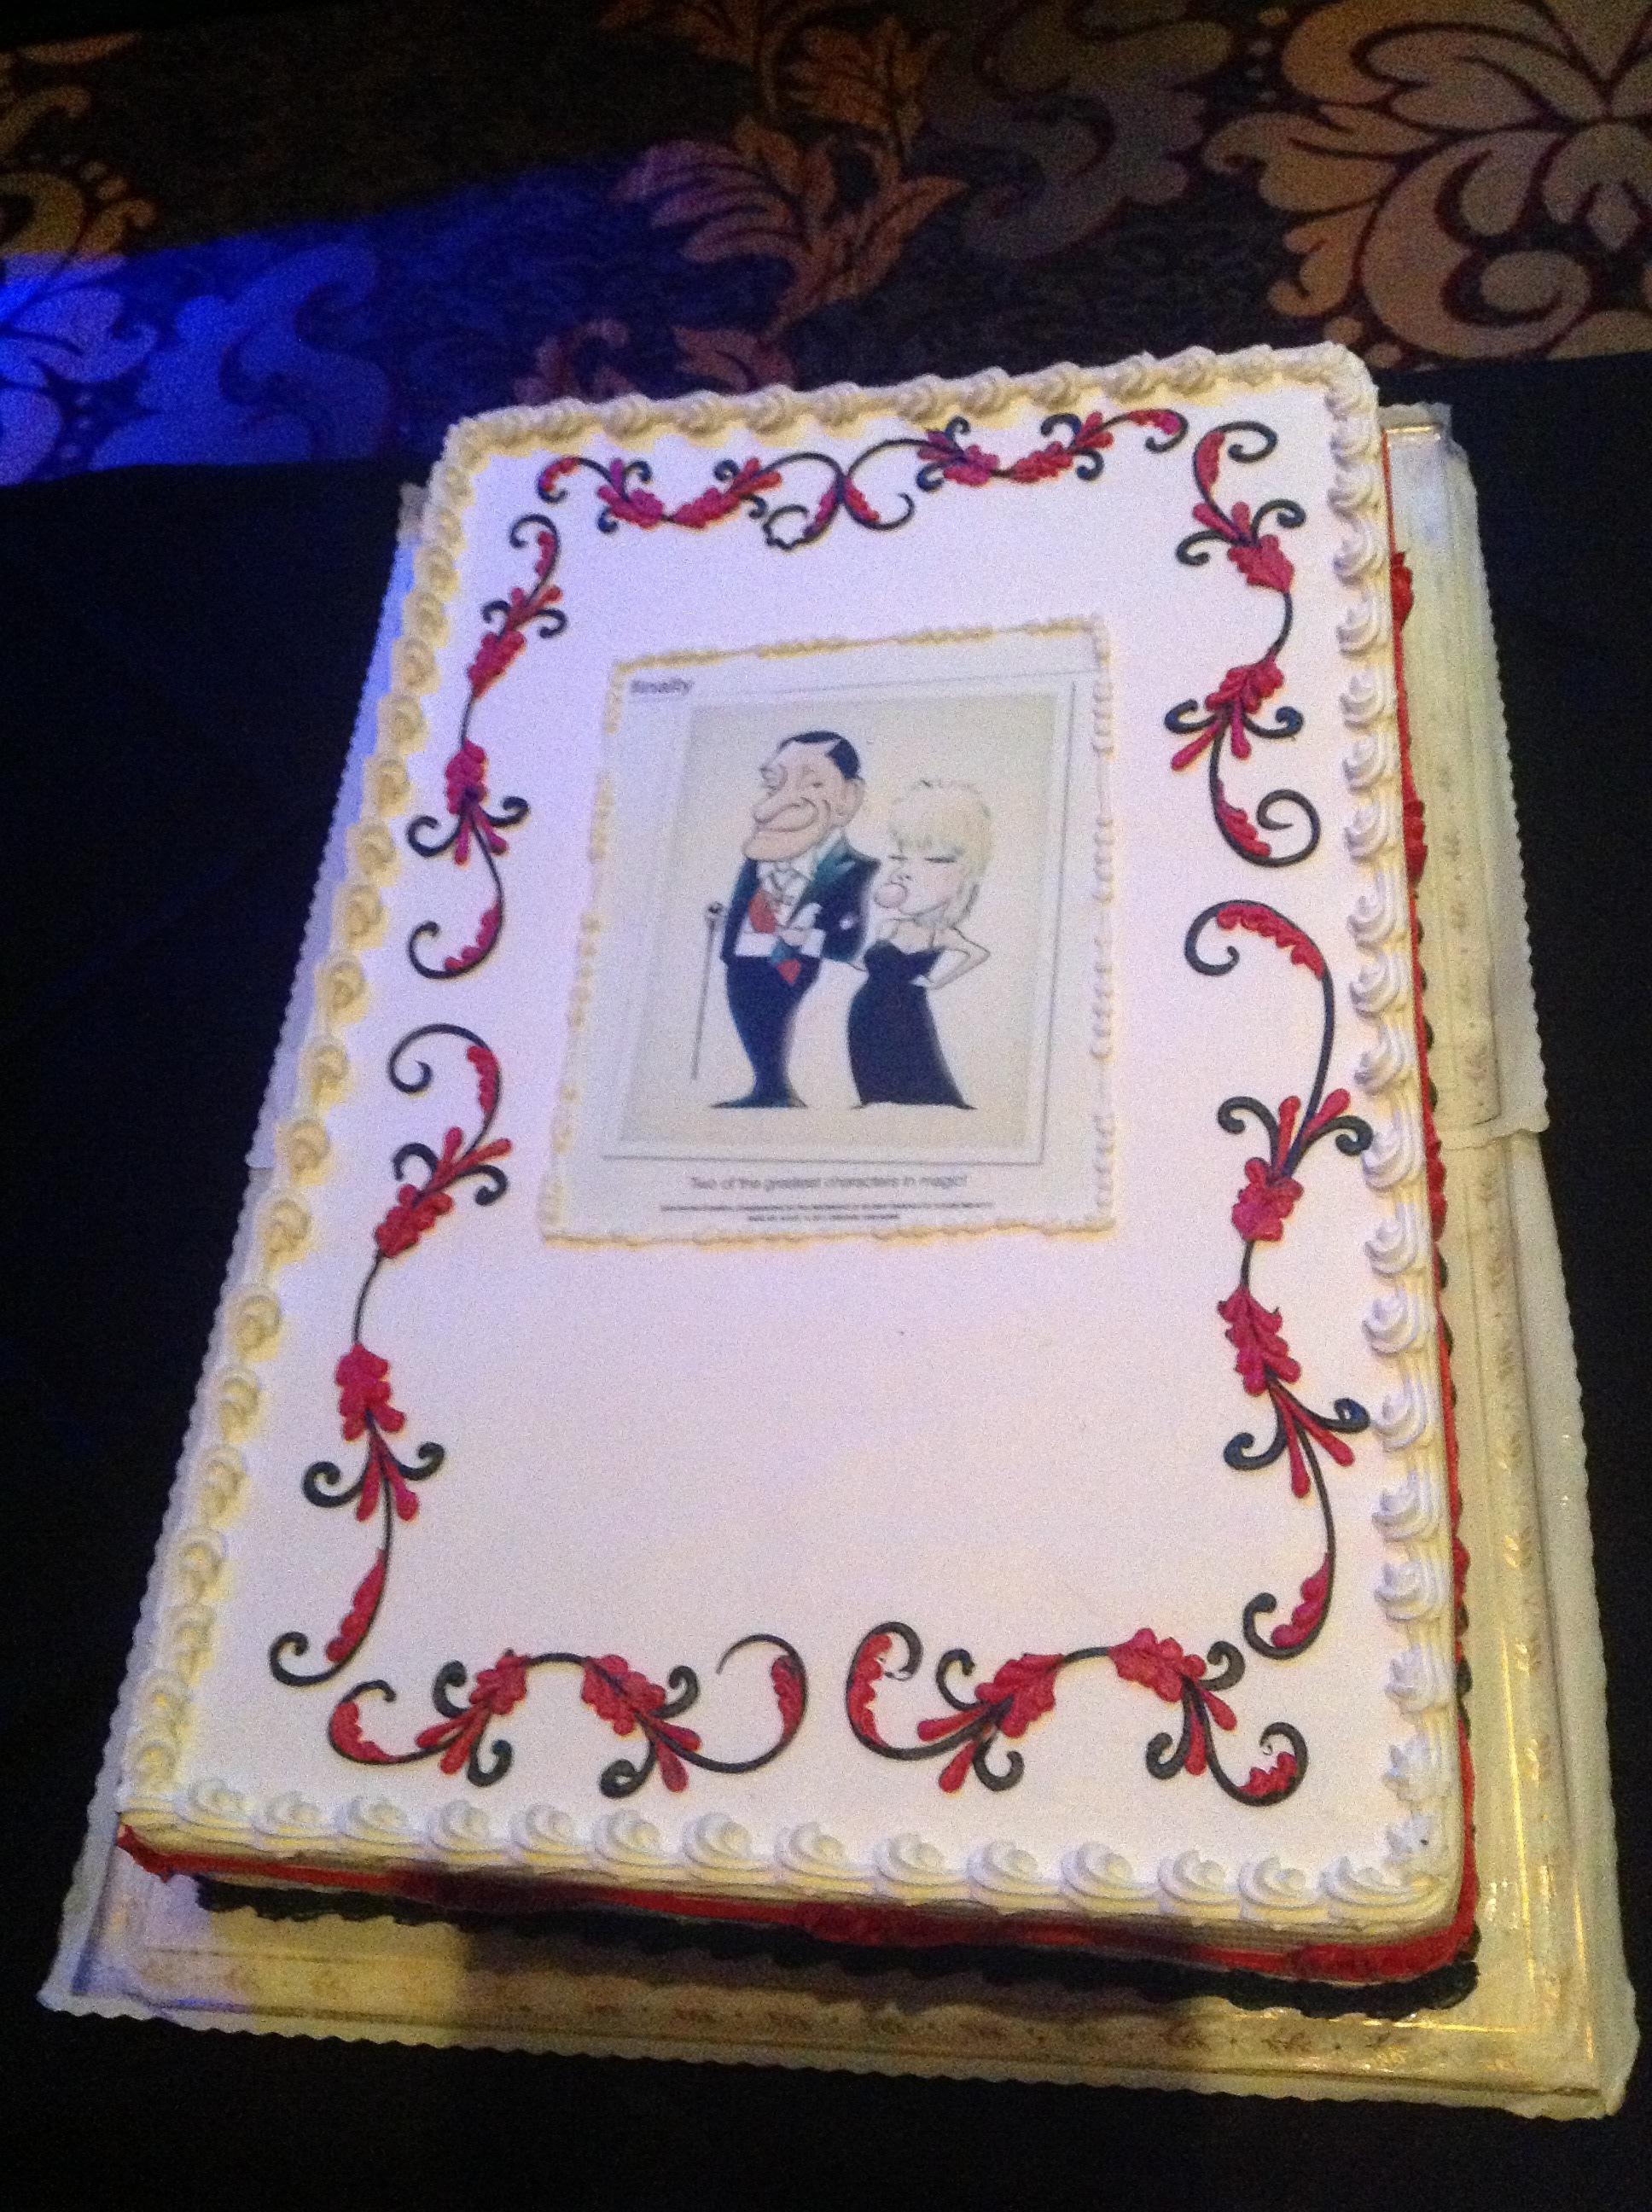 """Finally""Cake from Lance Burton"